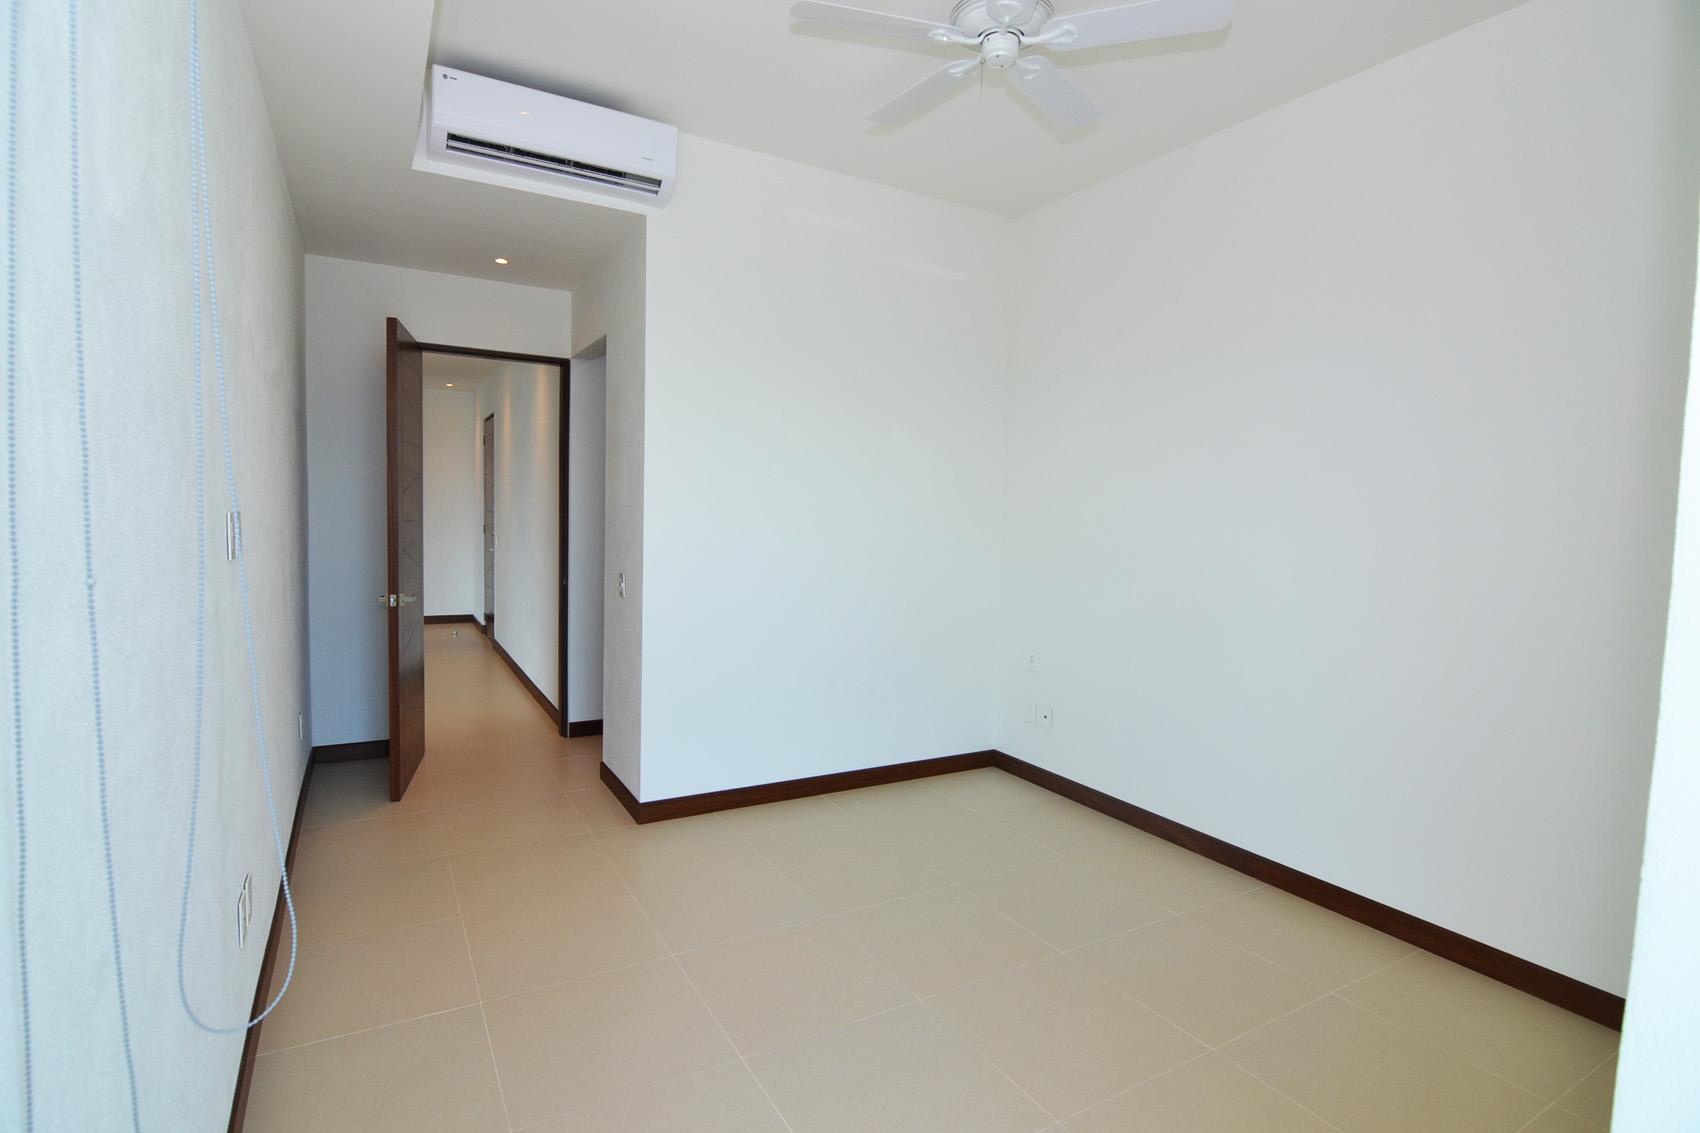 Condo VMarina PH10 - Puerto Vallarta Luxury Condo For Rent (20)